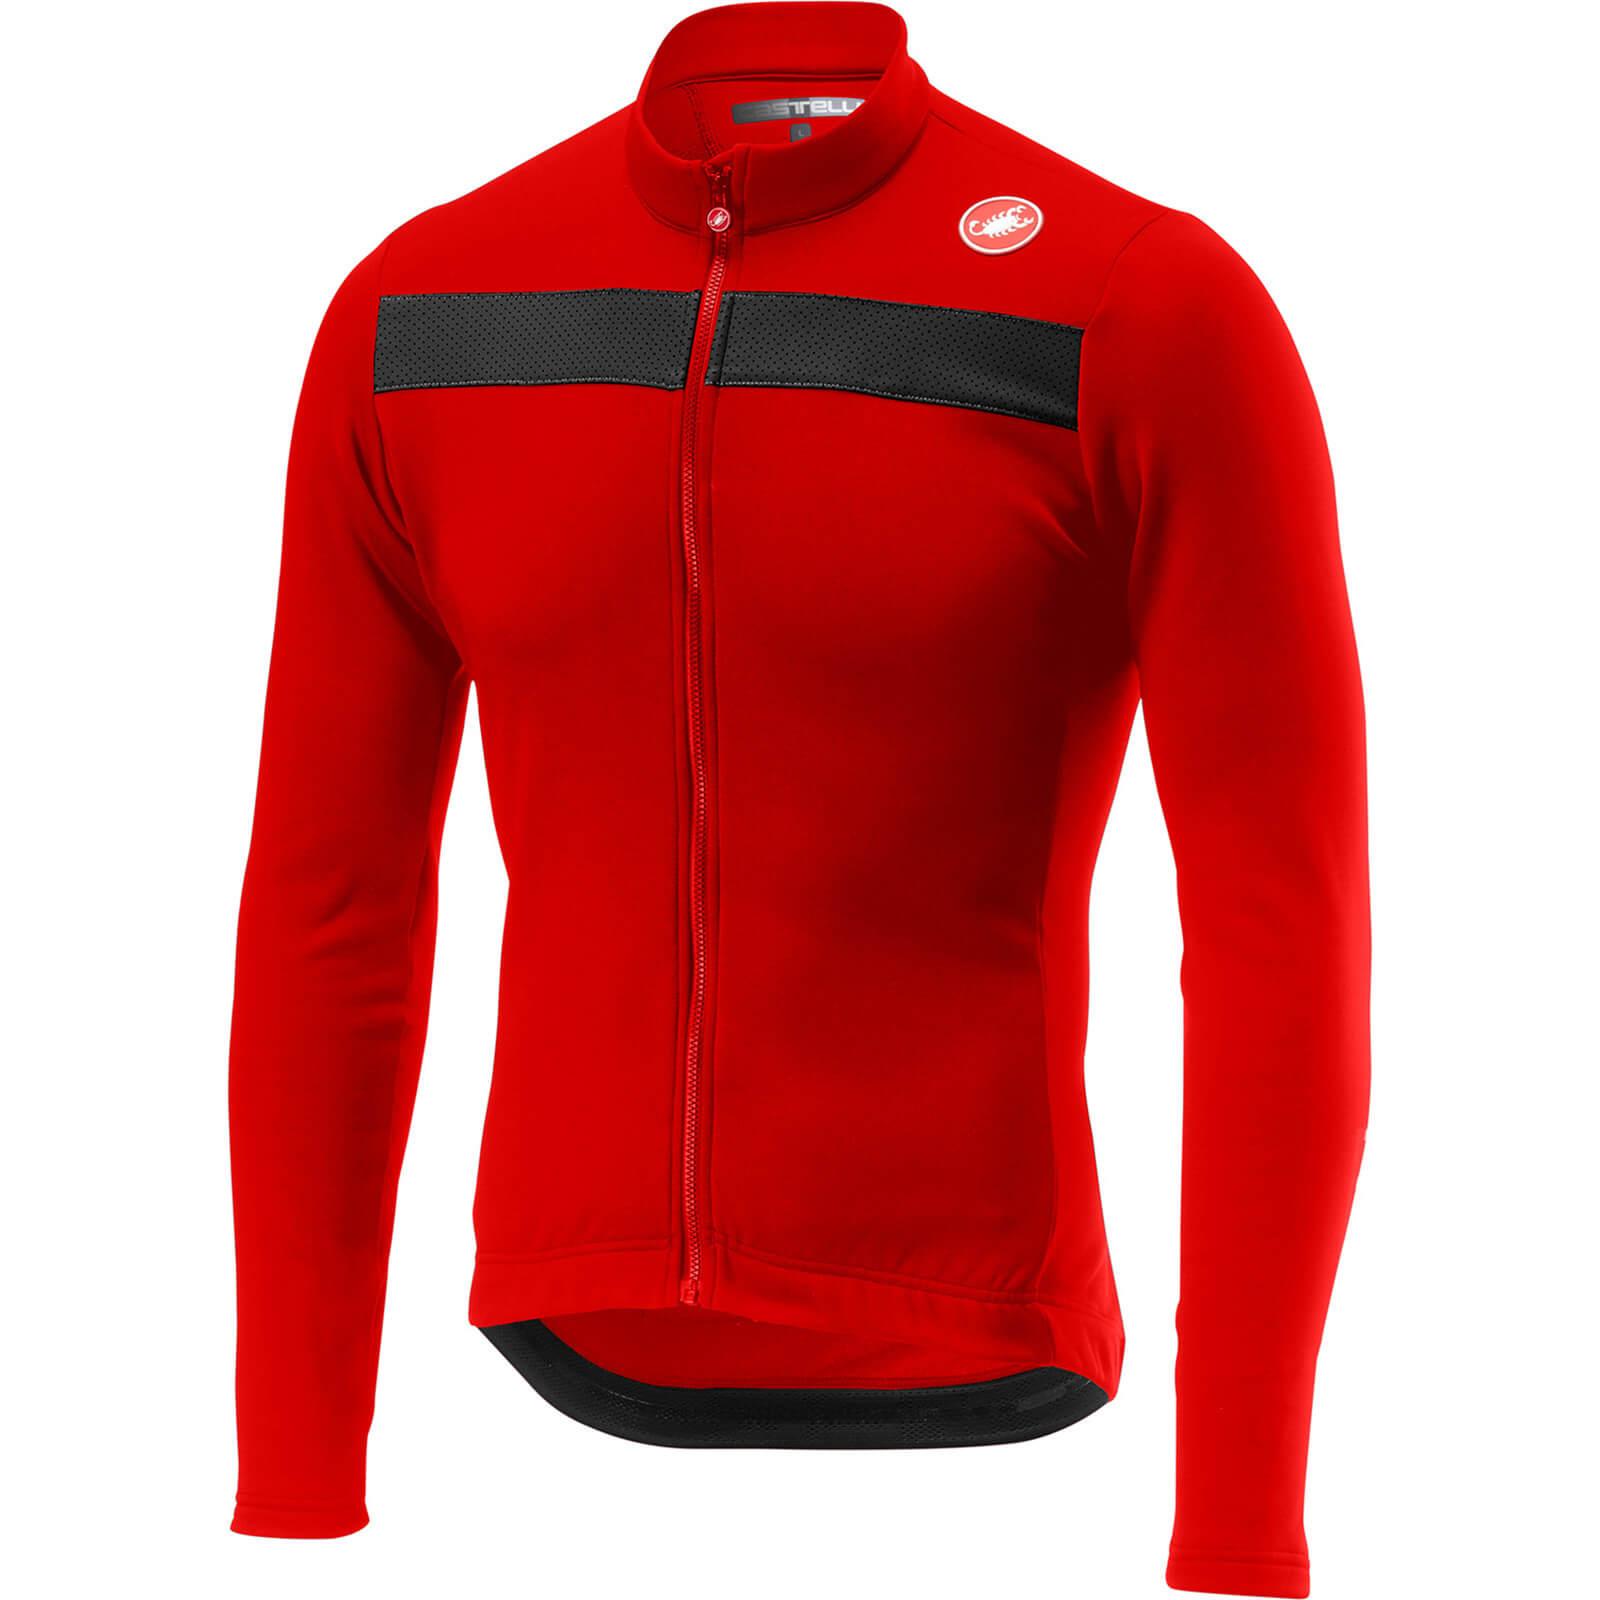 Castelli Puro 3 FZ Jersey - S - Red; male